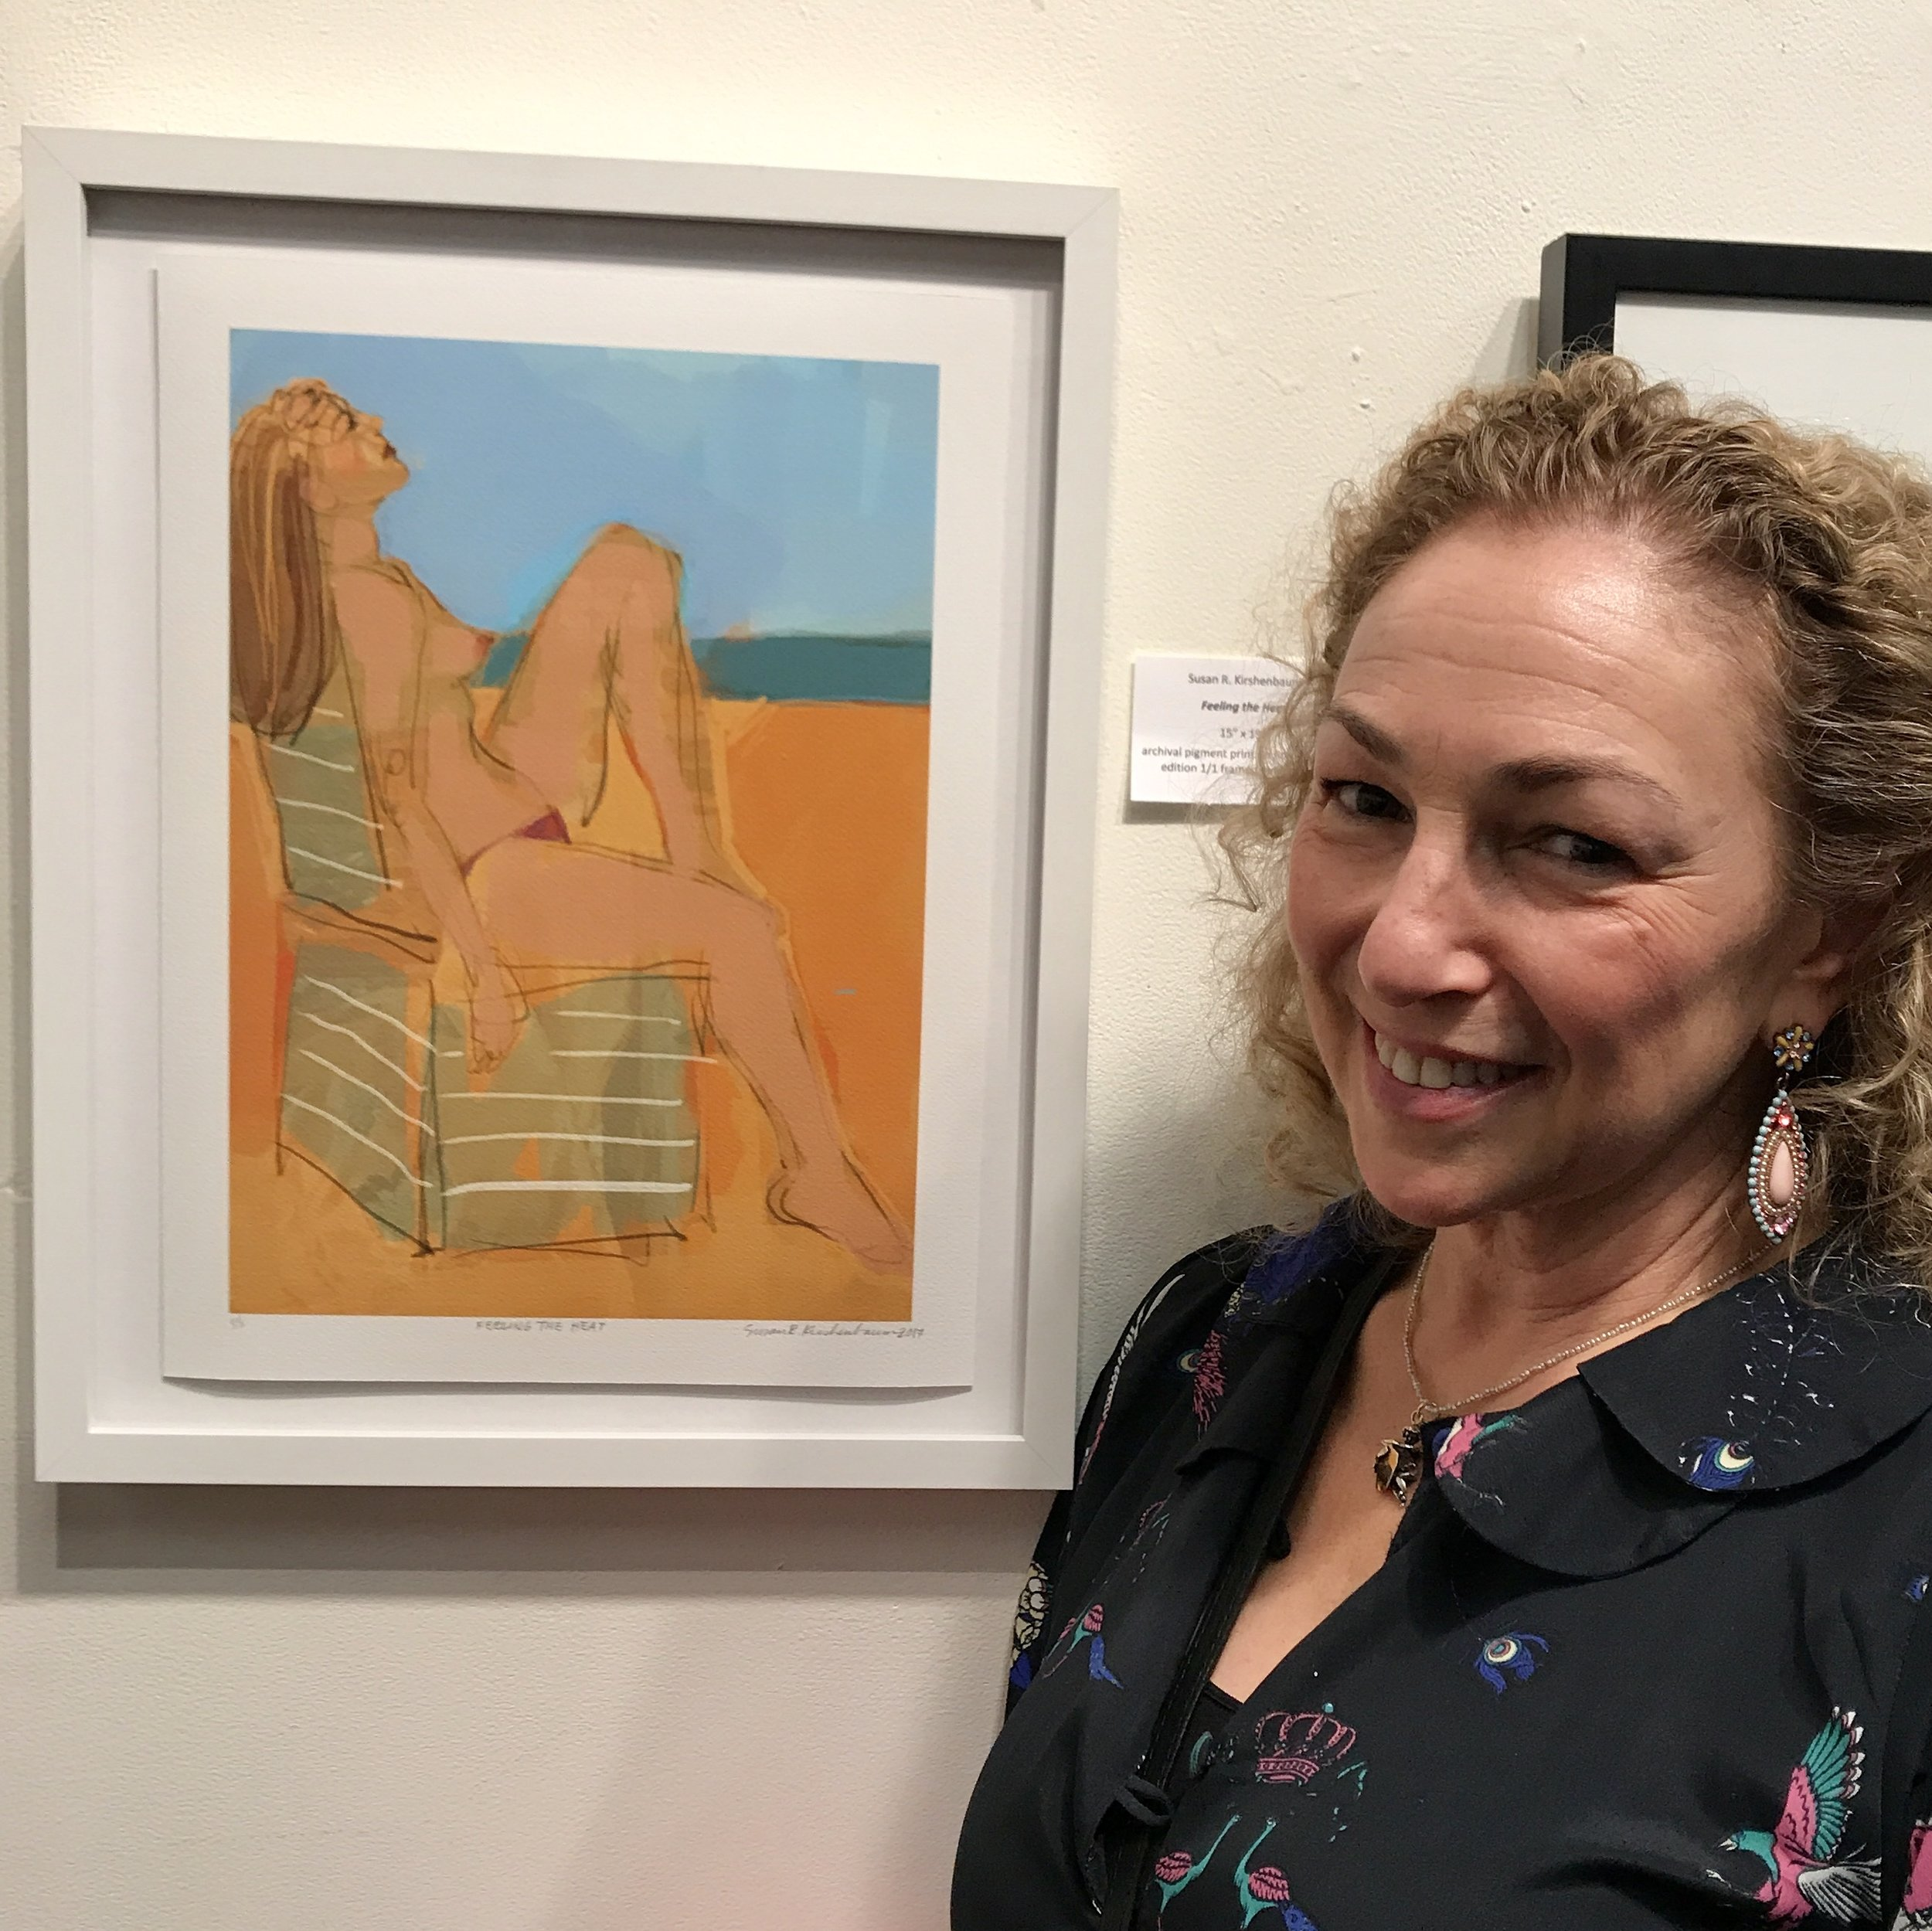 SNAP! Arc Gallery, SF, CA, 2018